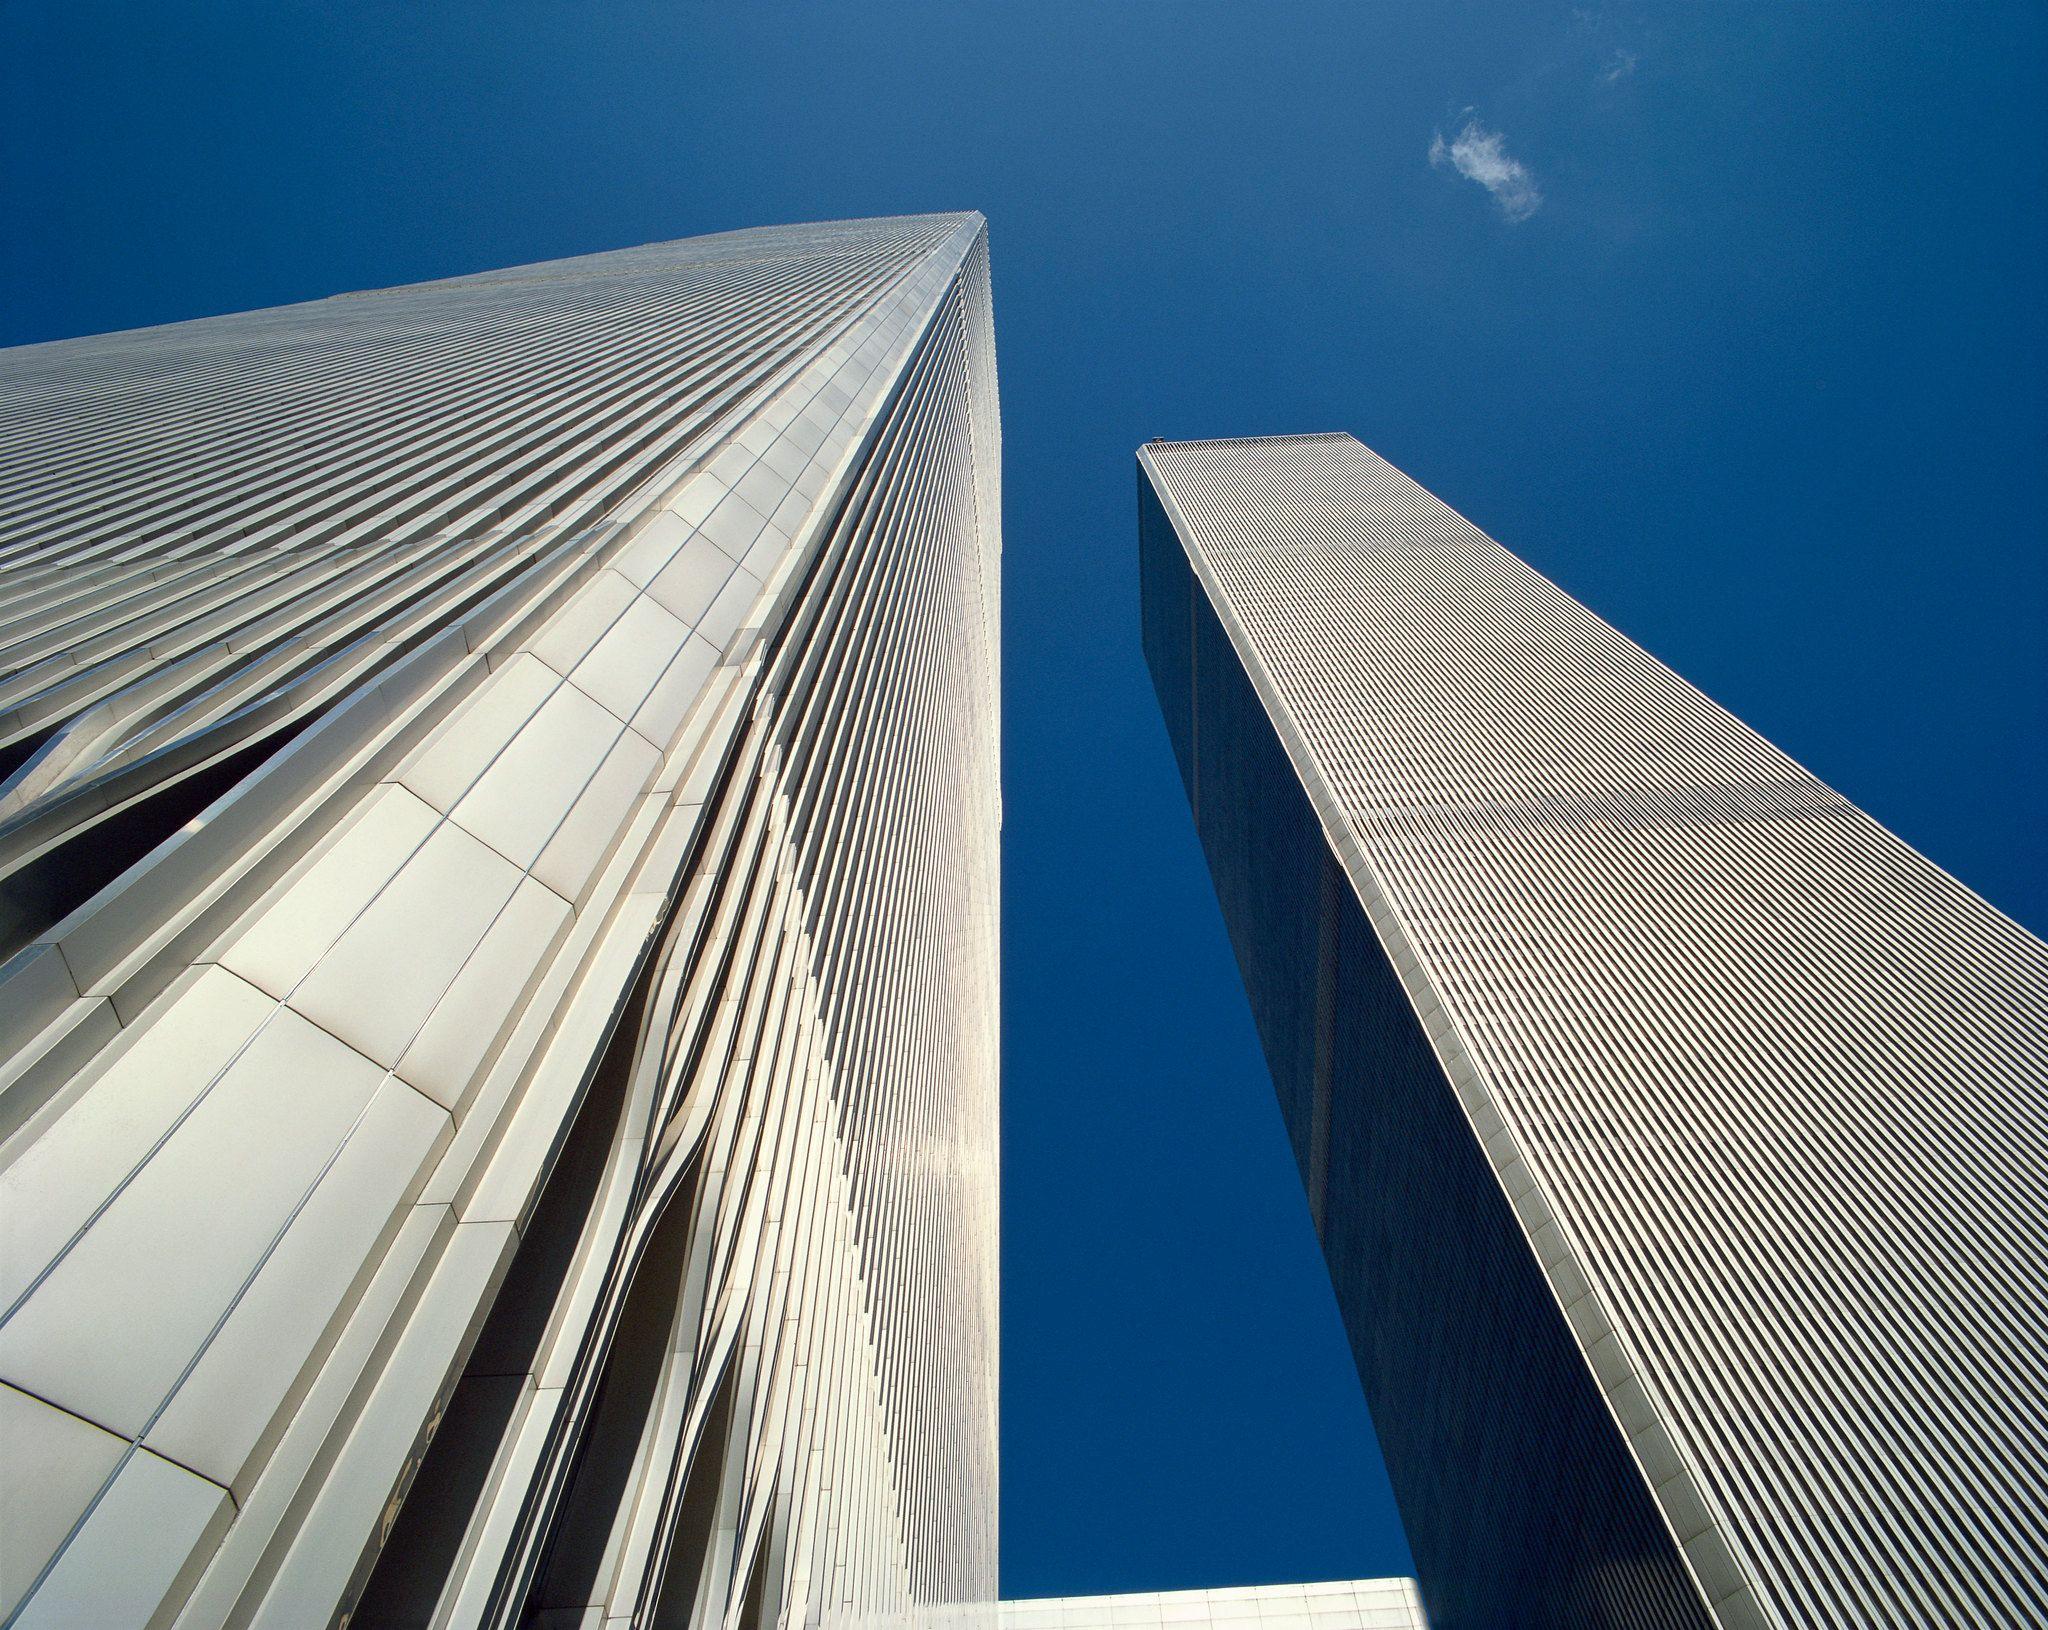 Twin towers, 110 stories high, worlds tallest   Modern